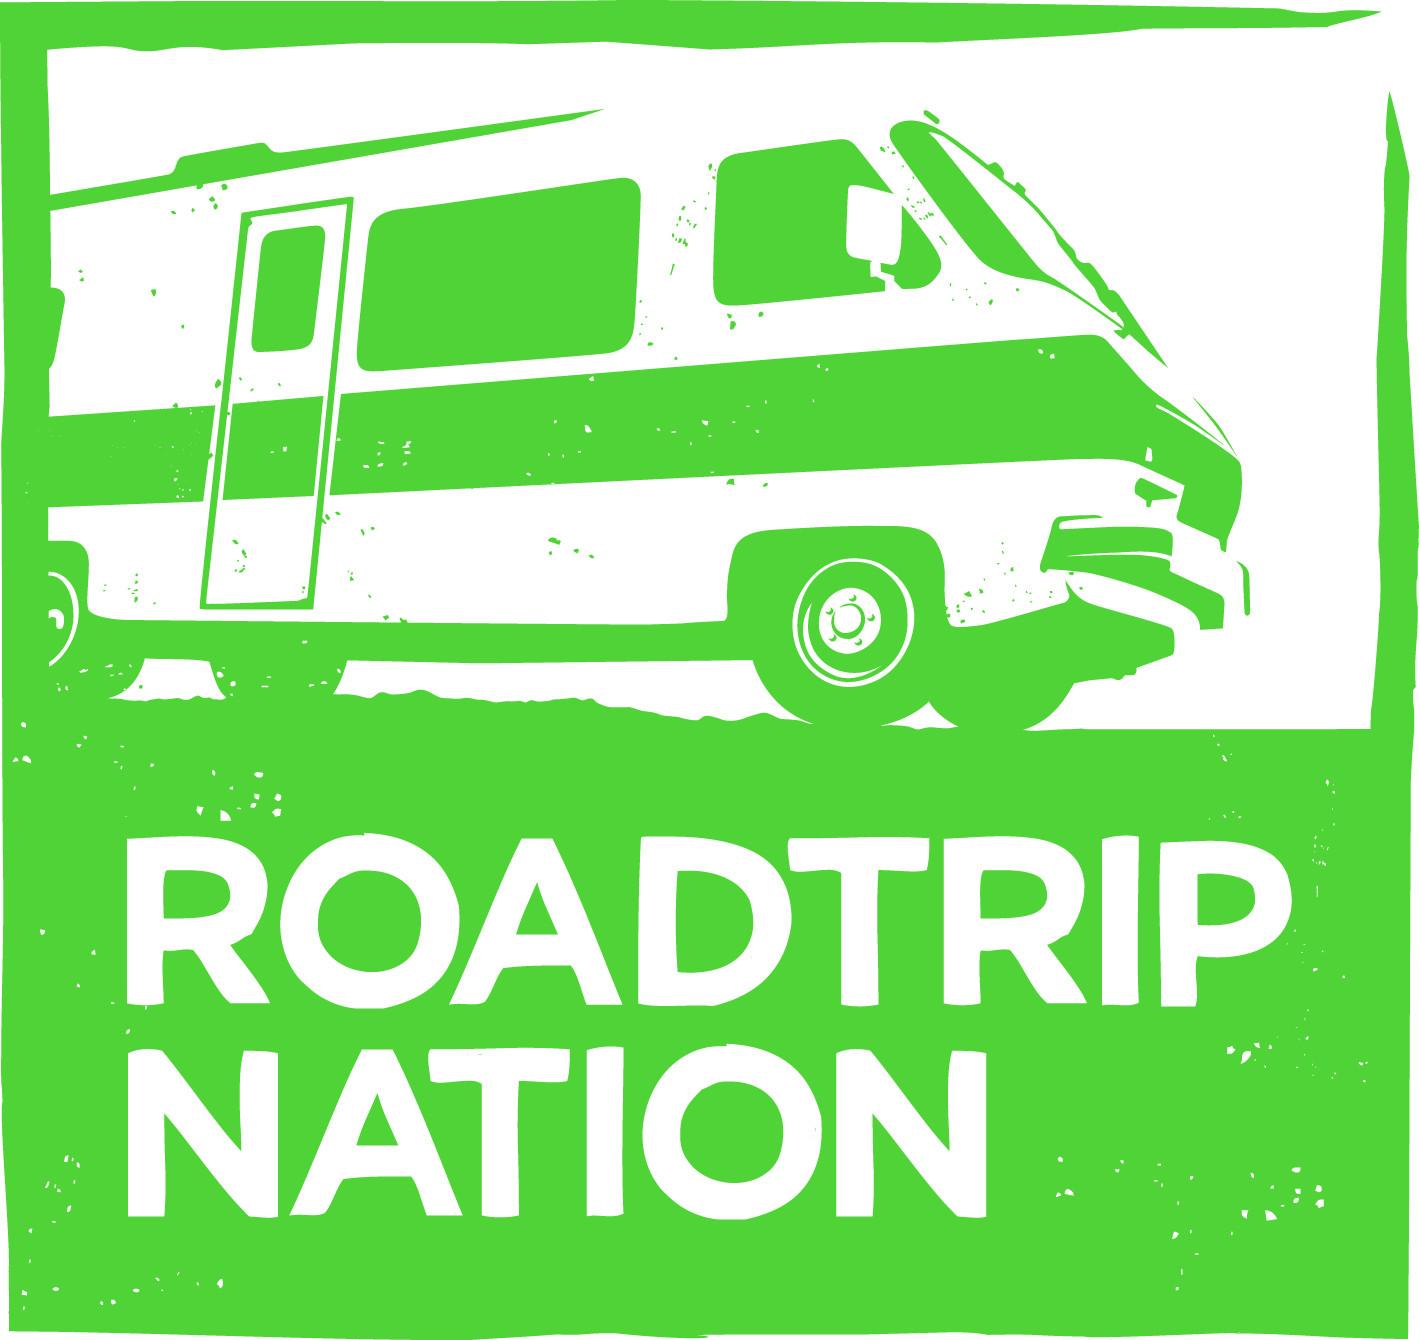 Roadtrip Productions LTD